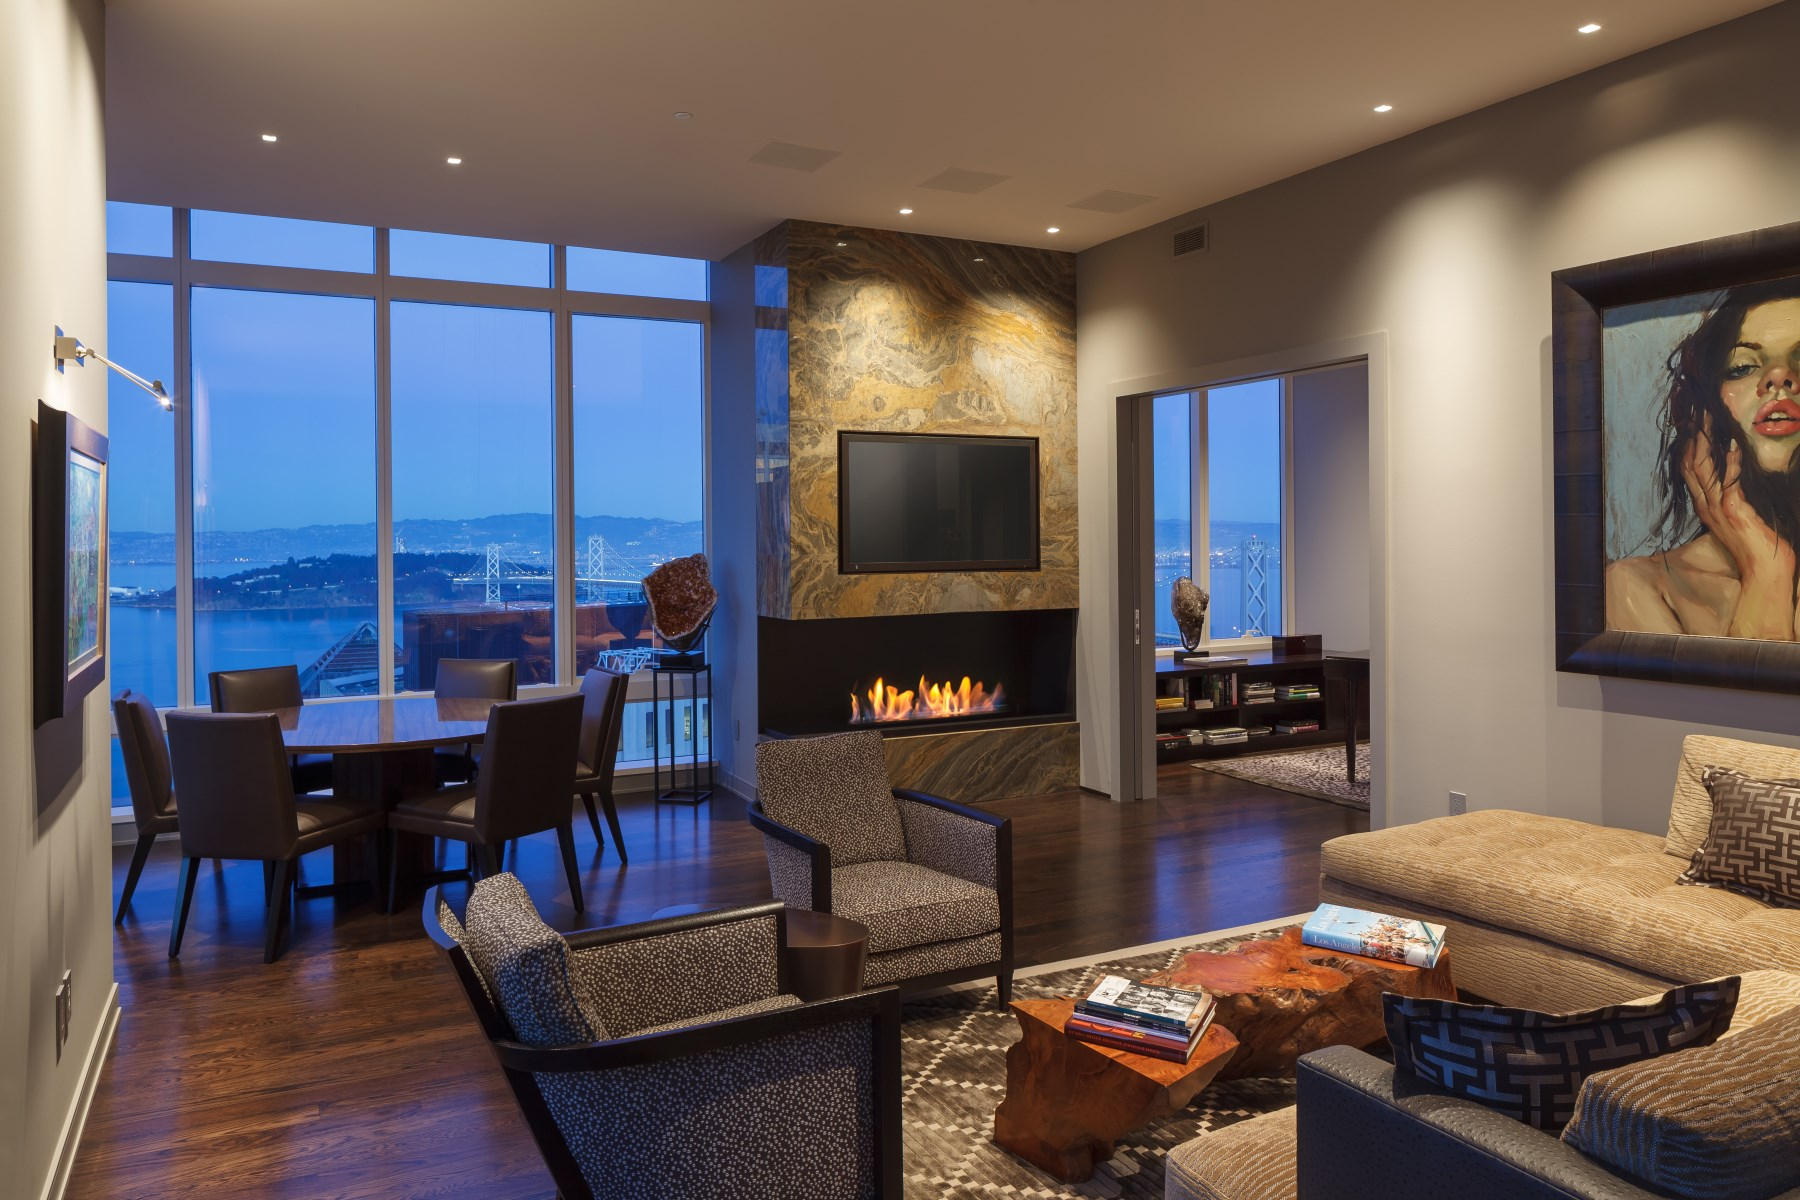 Condominium for Sale at Bespoke Residence with Landmark Views 301 Mission St Apt 48B San Francisco, California, 94105 United States